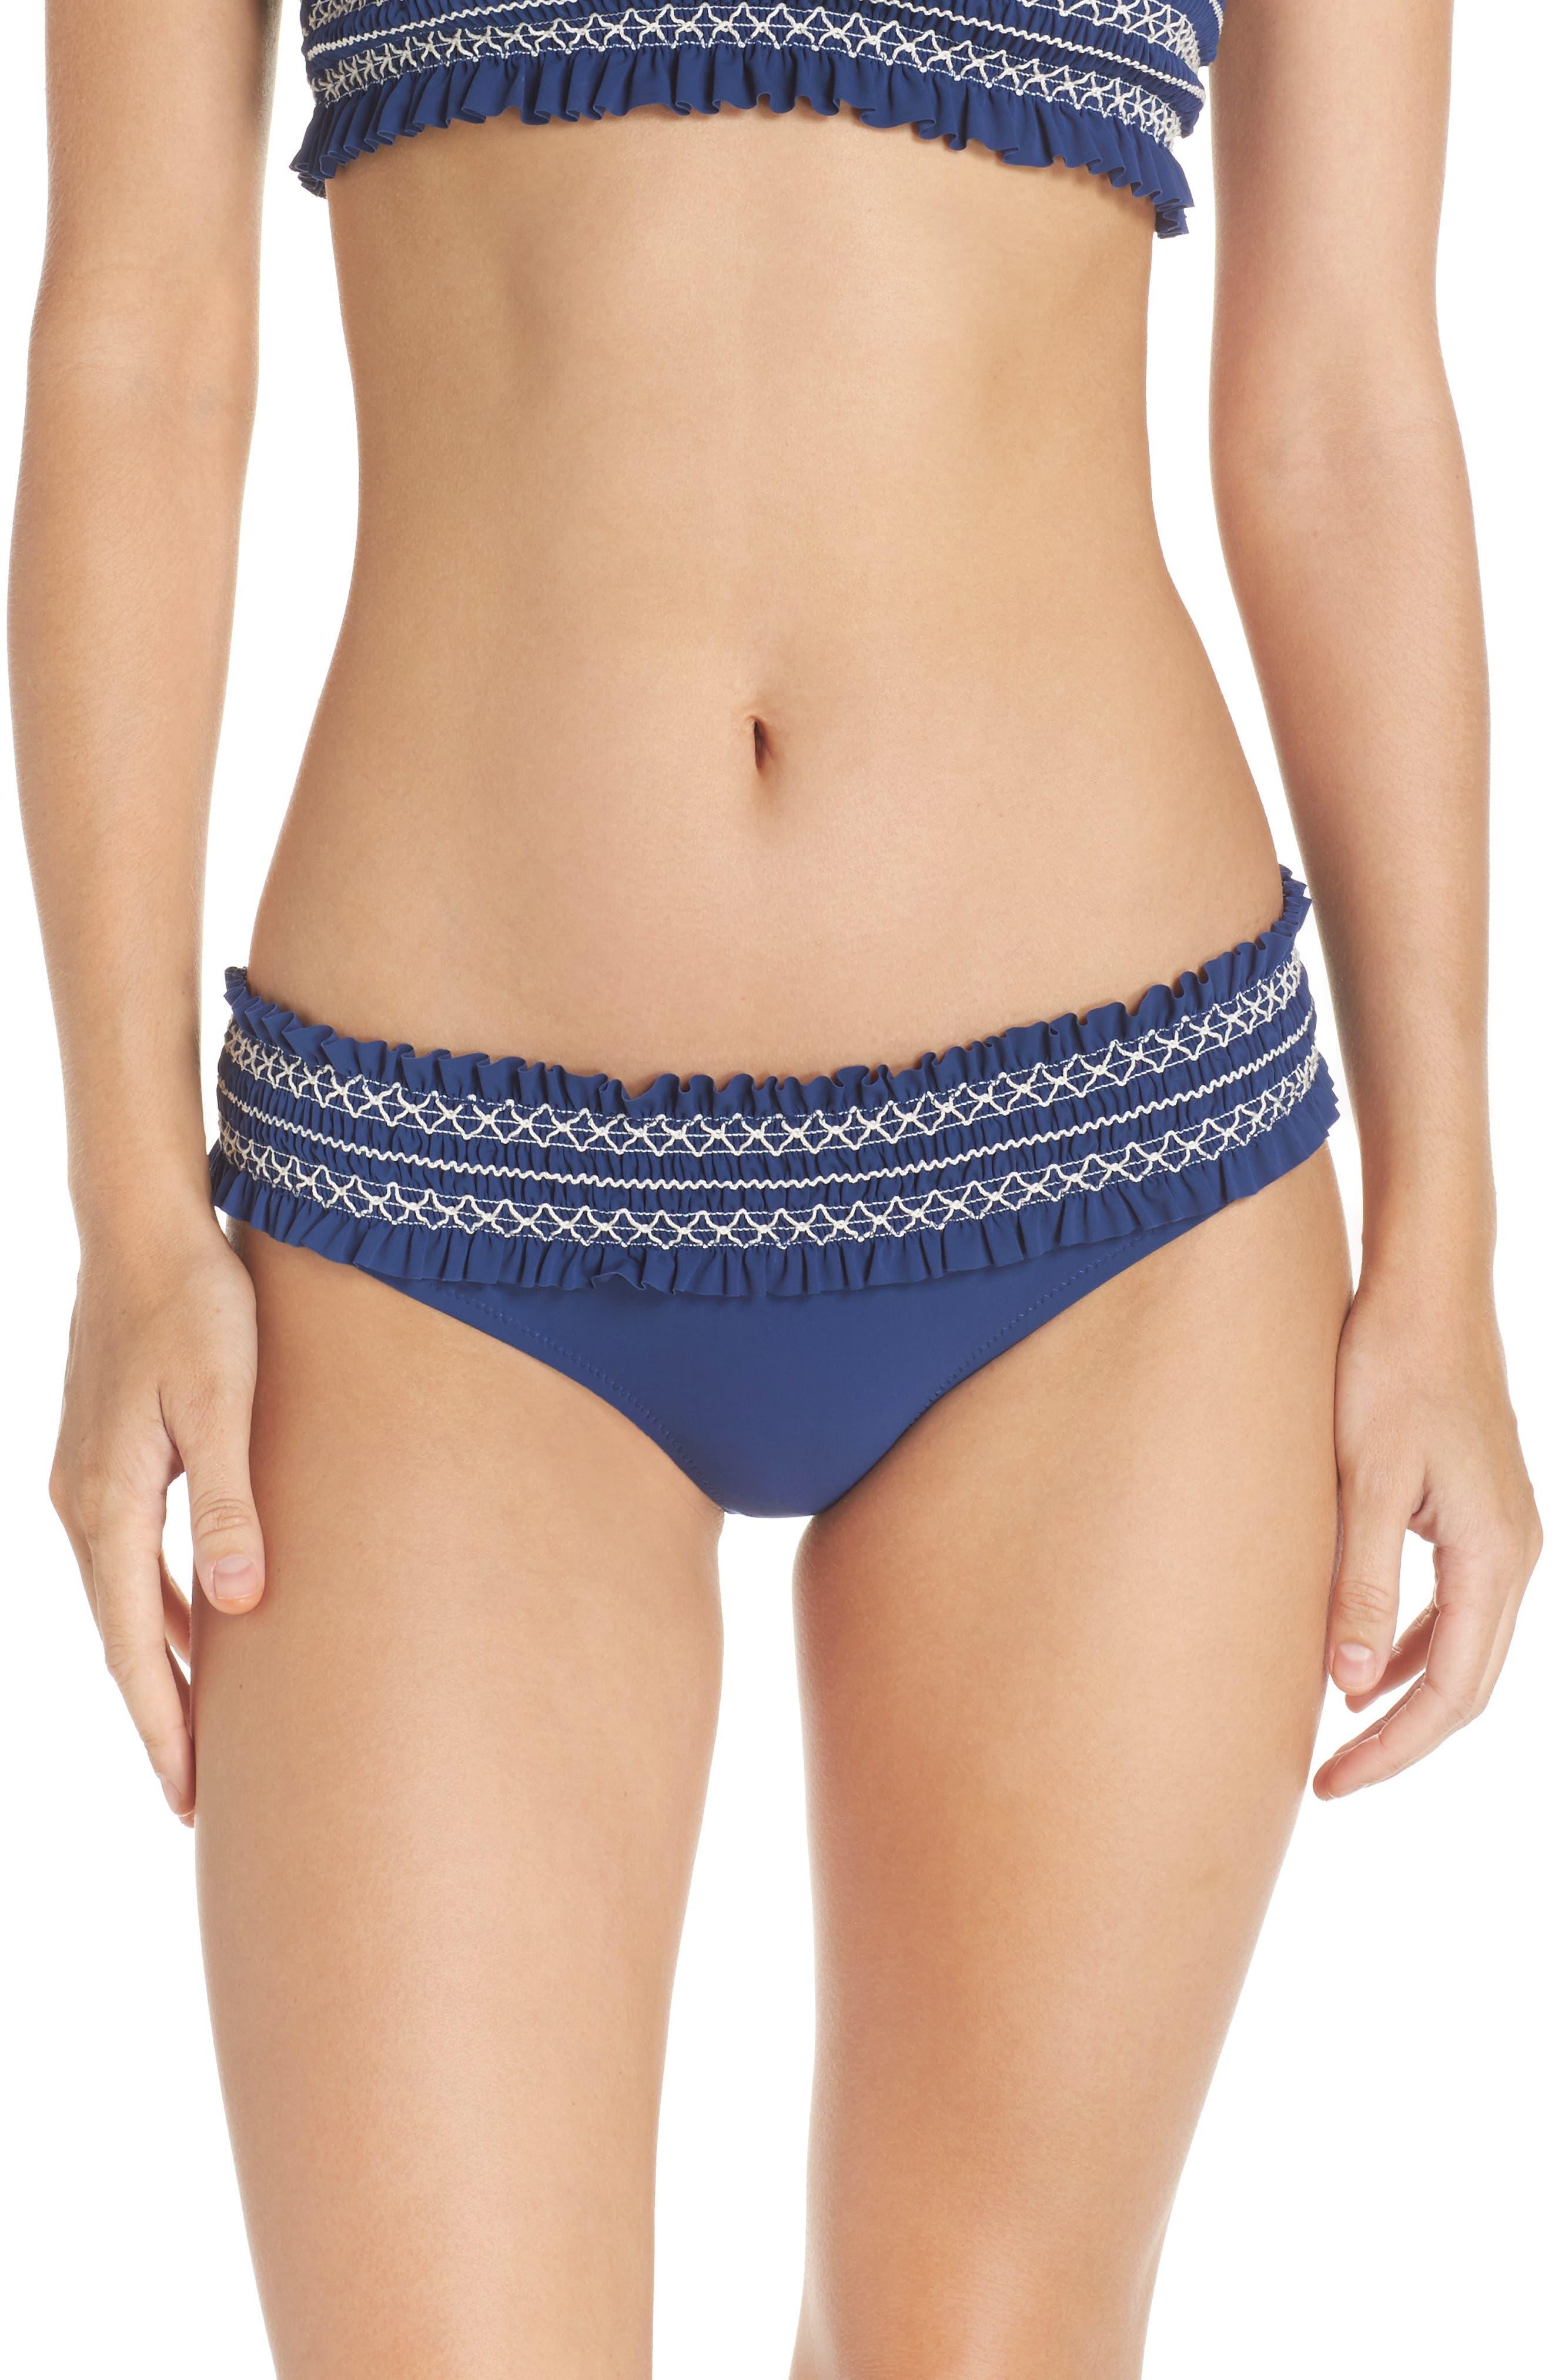 Alternate Image 1 Selected - Tory Burch Costa Smocked Hipster Bikini Bottoms